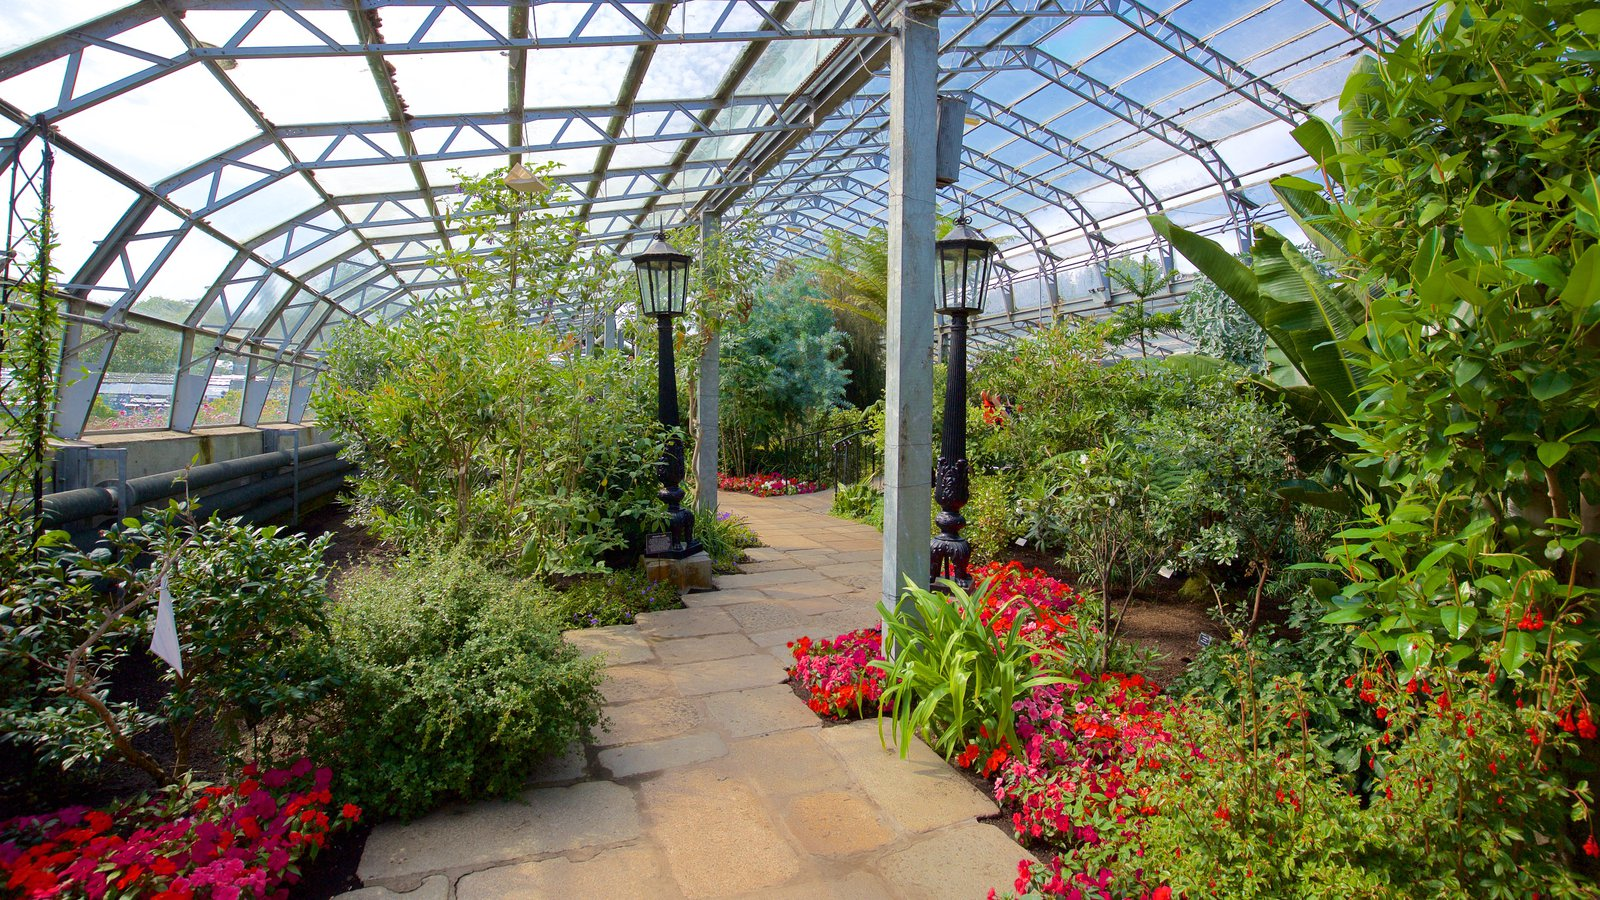 Duthie Park Winter Gardens showing interior views and a garden